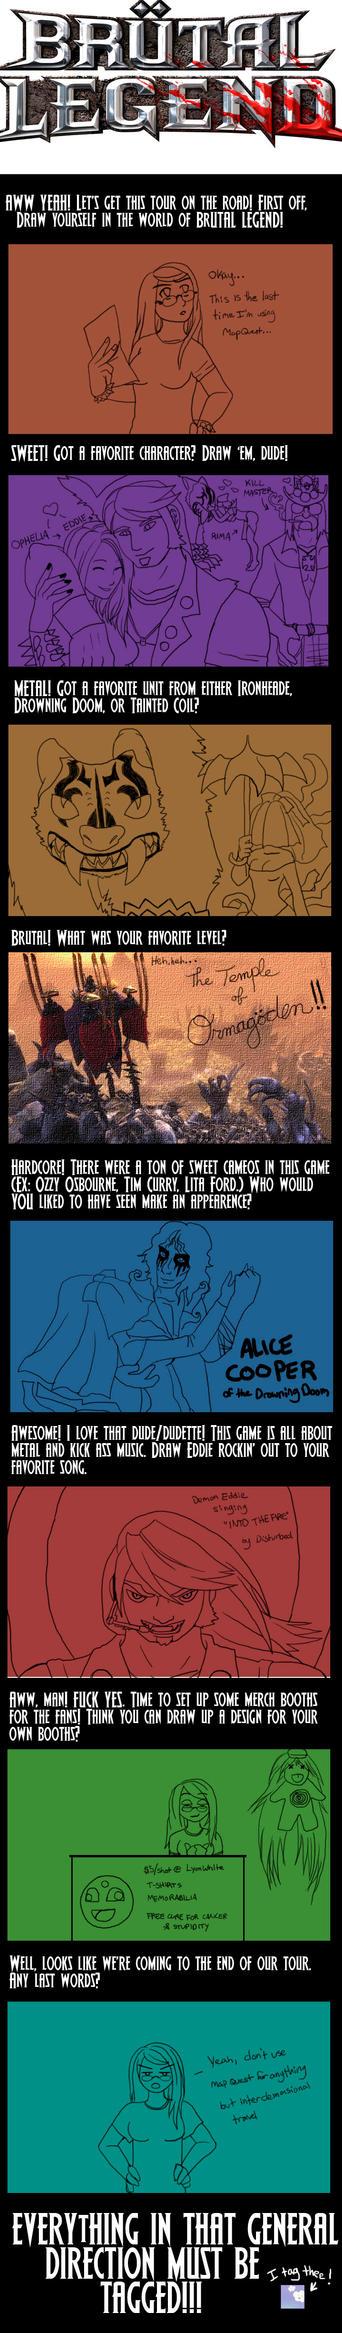 Brutal Meme by silver-death01